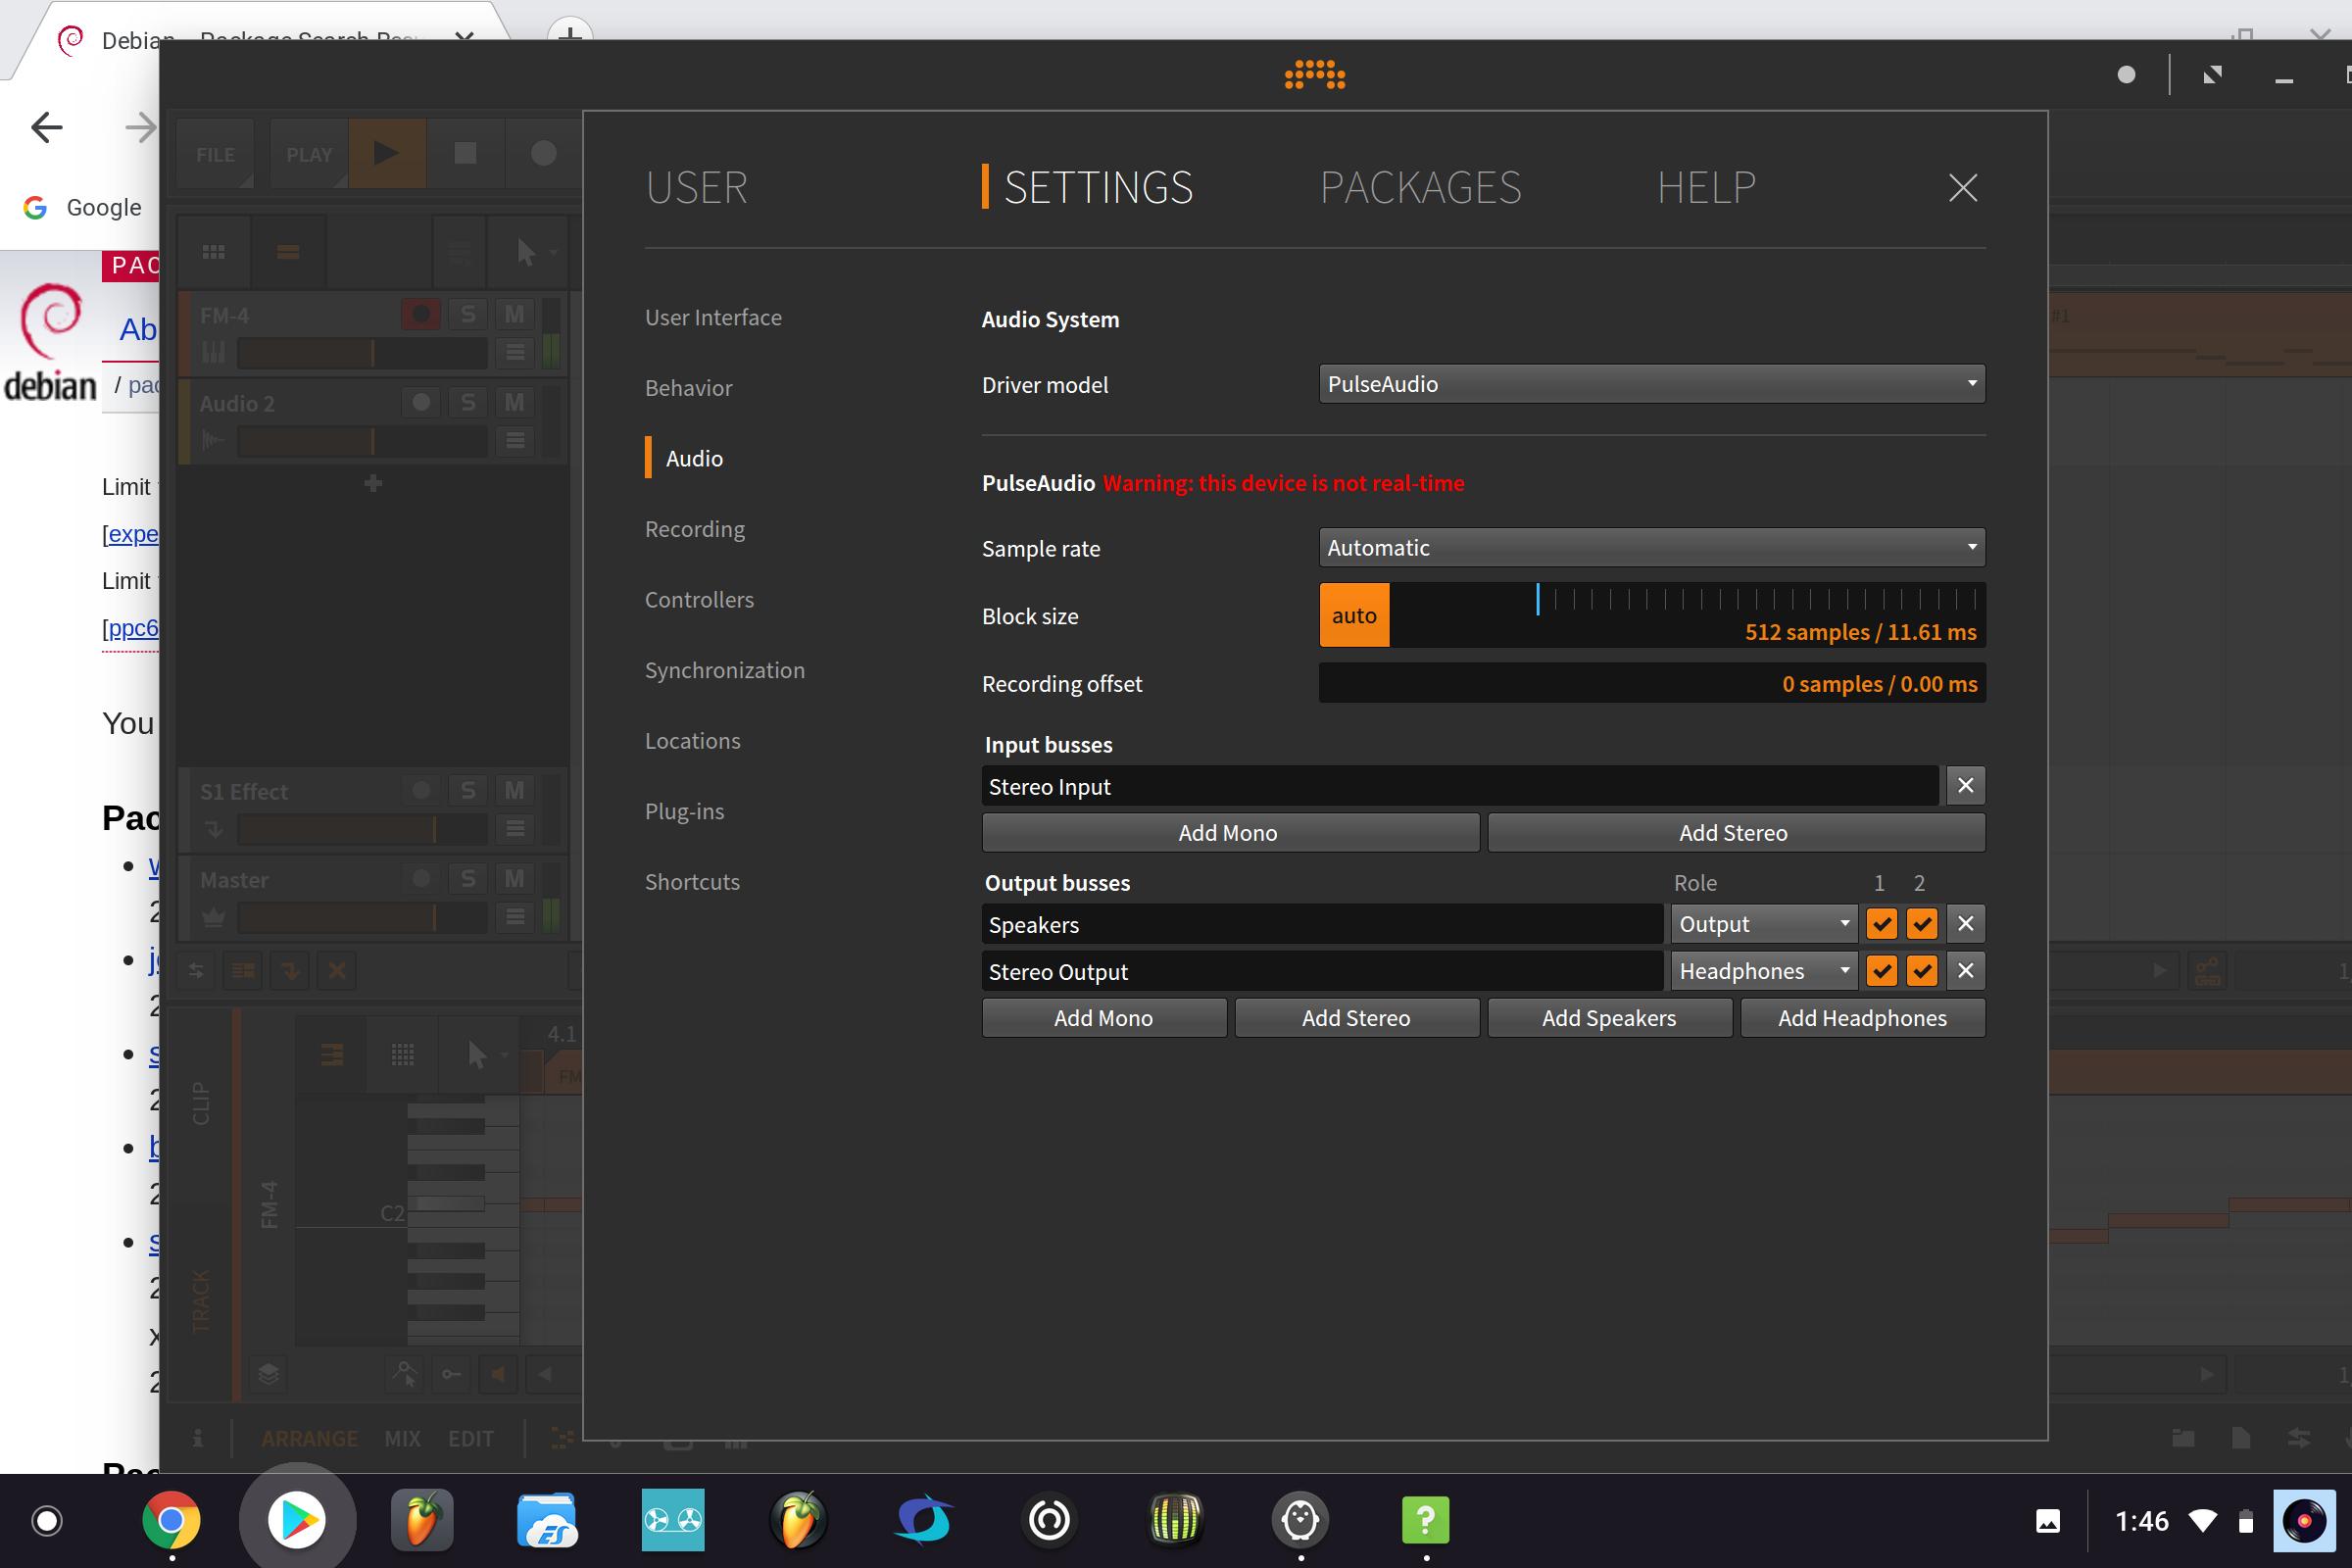 Blank Linux Terminal on Dev Channel Version 68 0 3431 0 - Pixelbook Help